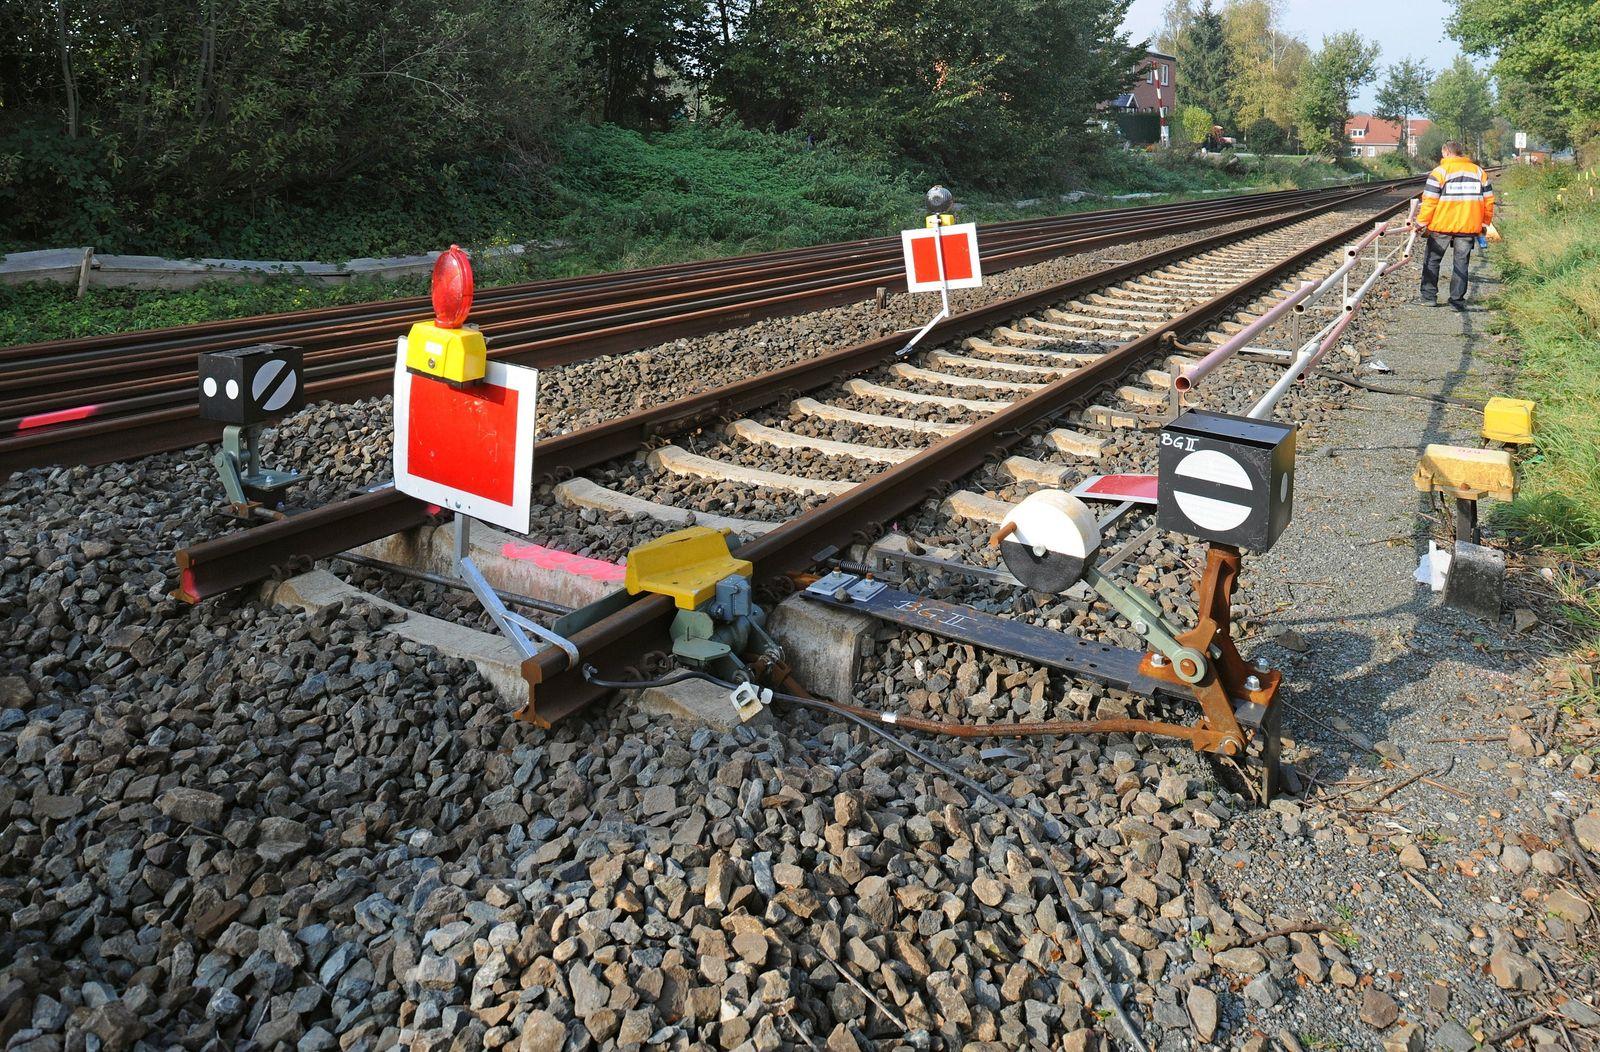 Bahn / Gleise / Sperrung / Bauarbeiten